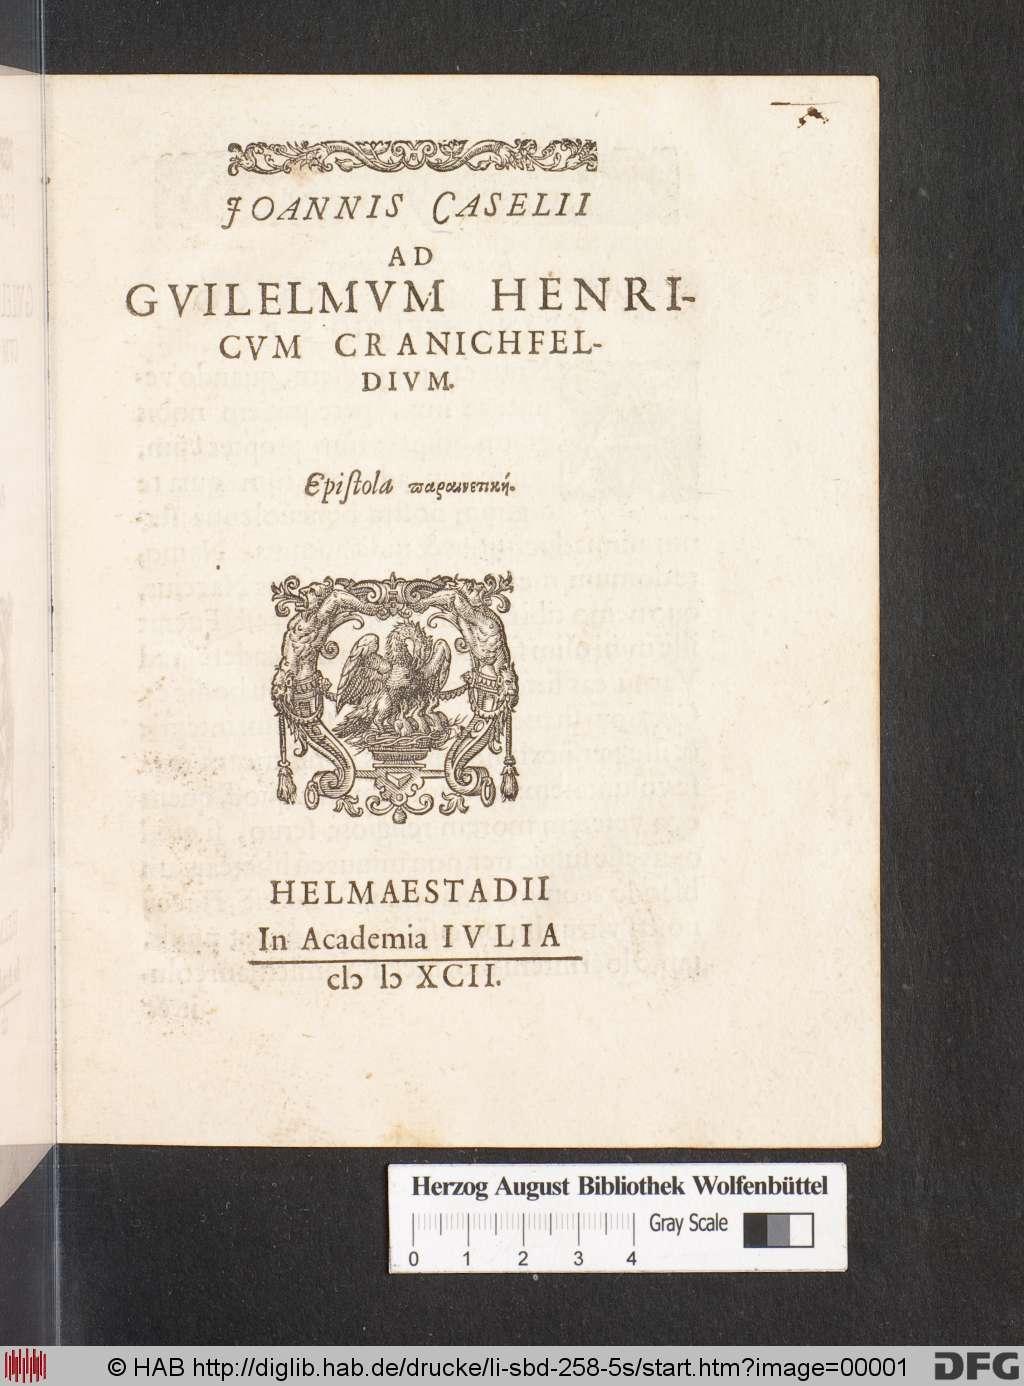 http://diglib.hab.de/drucke/li-sbd-258-5s/00001.jpg